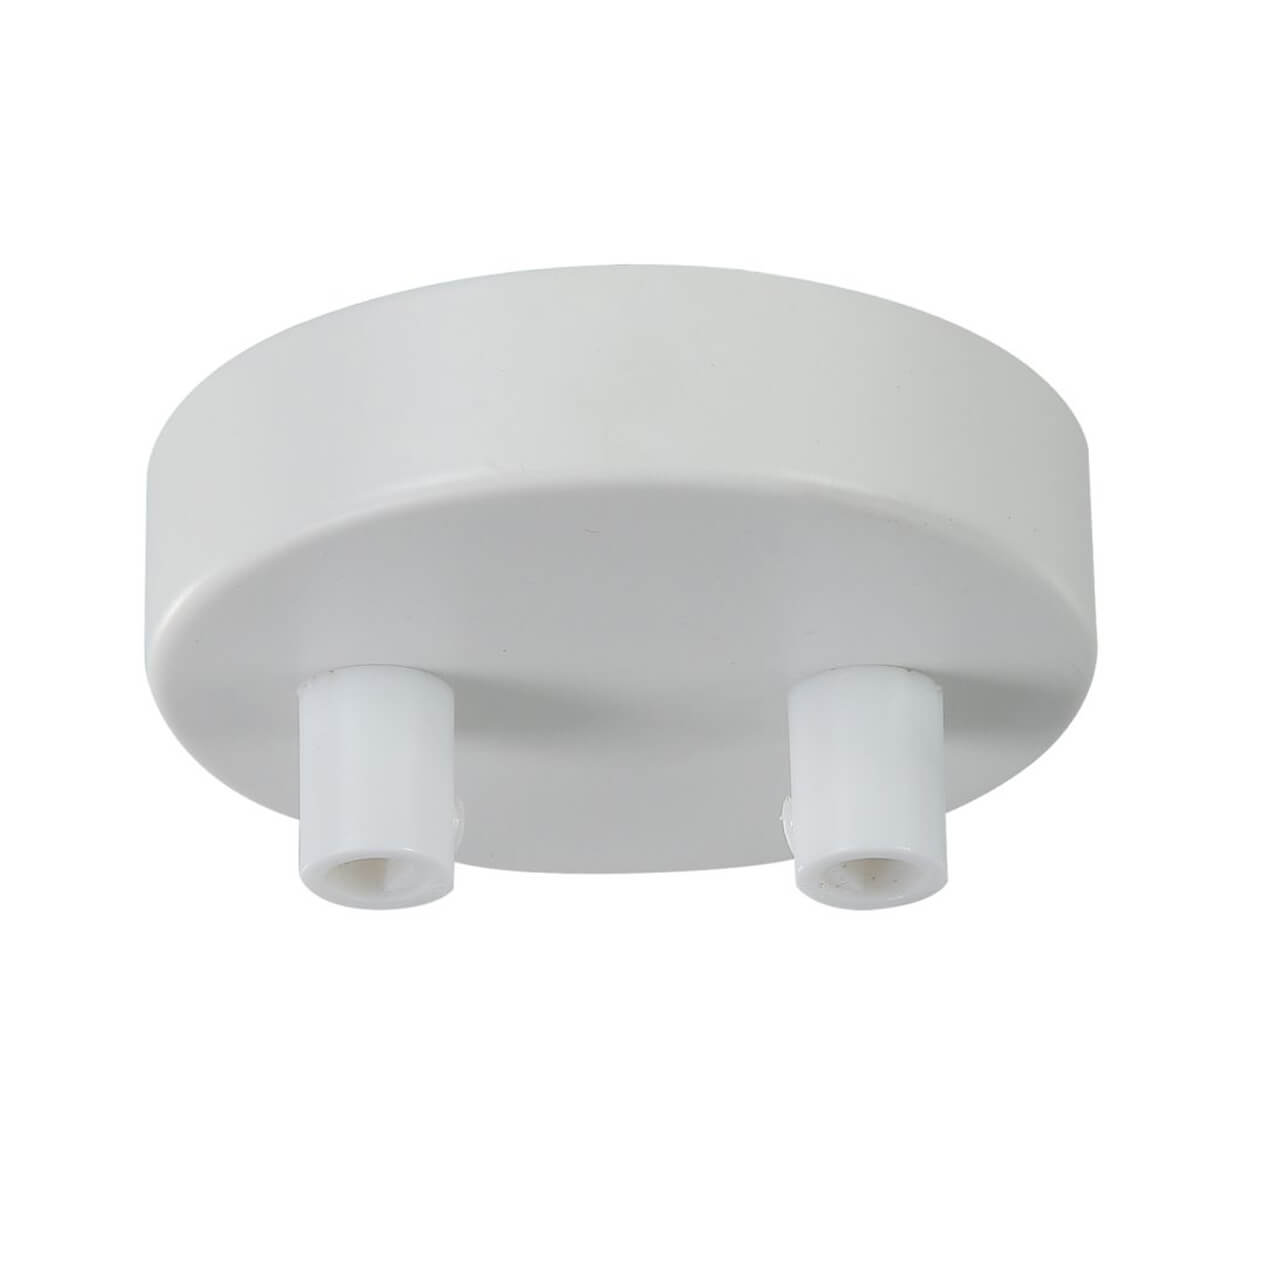 Основание для подвесного светильника Maytoni Universal Base SPR-BASE-R-02-W недорого